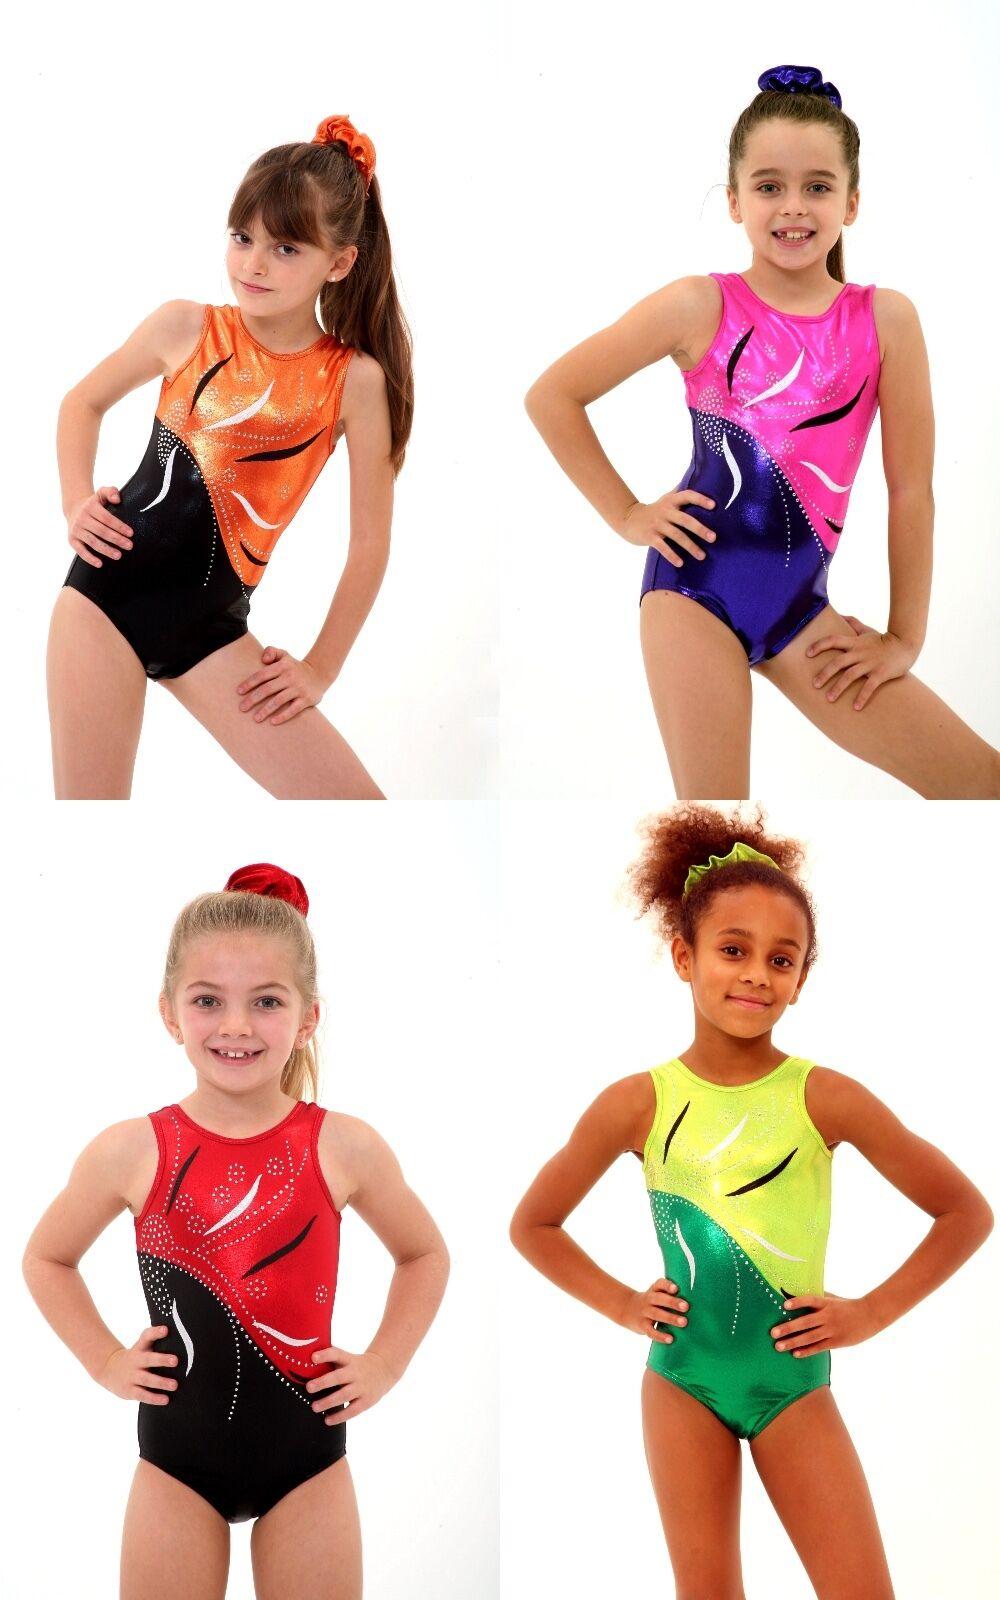 ALL SIZES Fleur Bodice Girls Gymnastics Leotard 26,28,30,32,34,36,38 Foil Gems